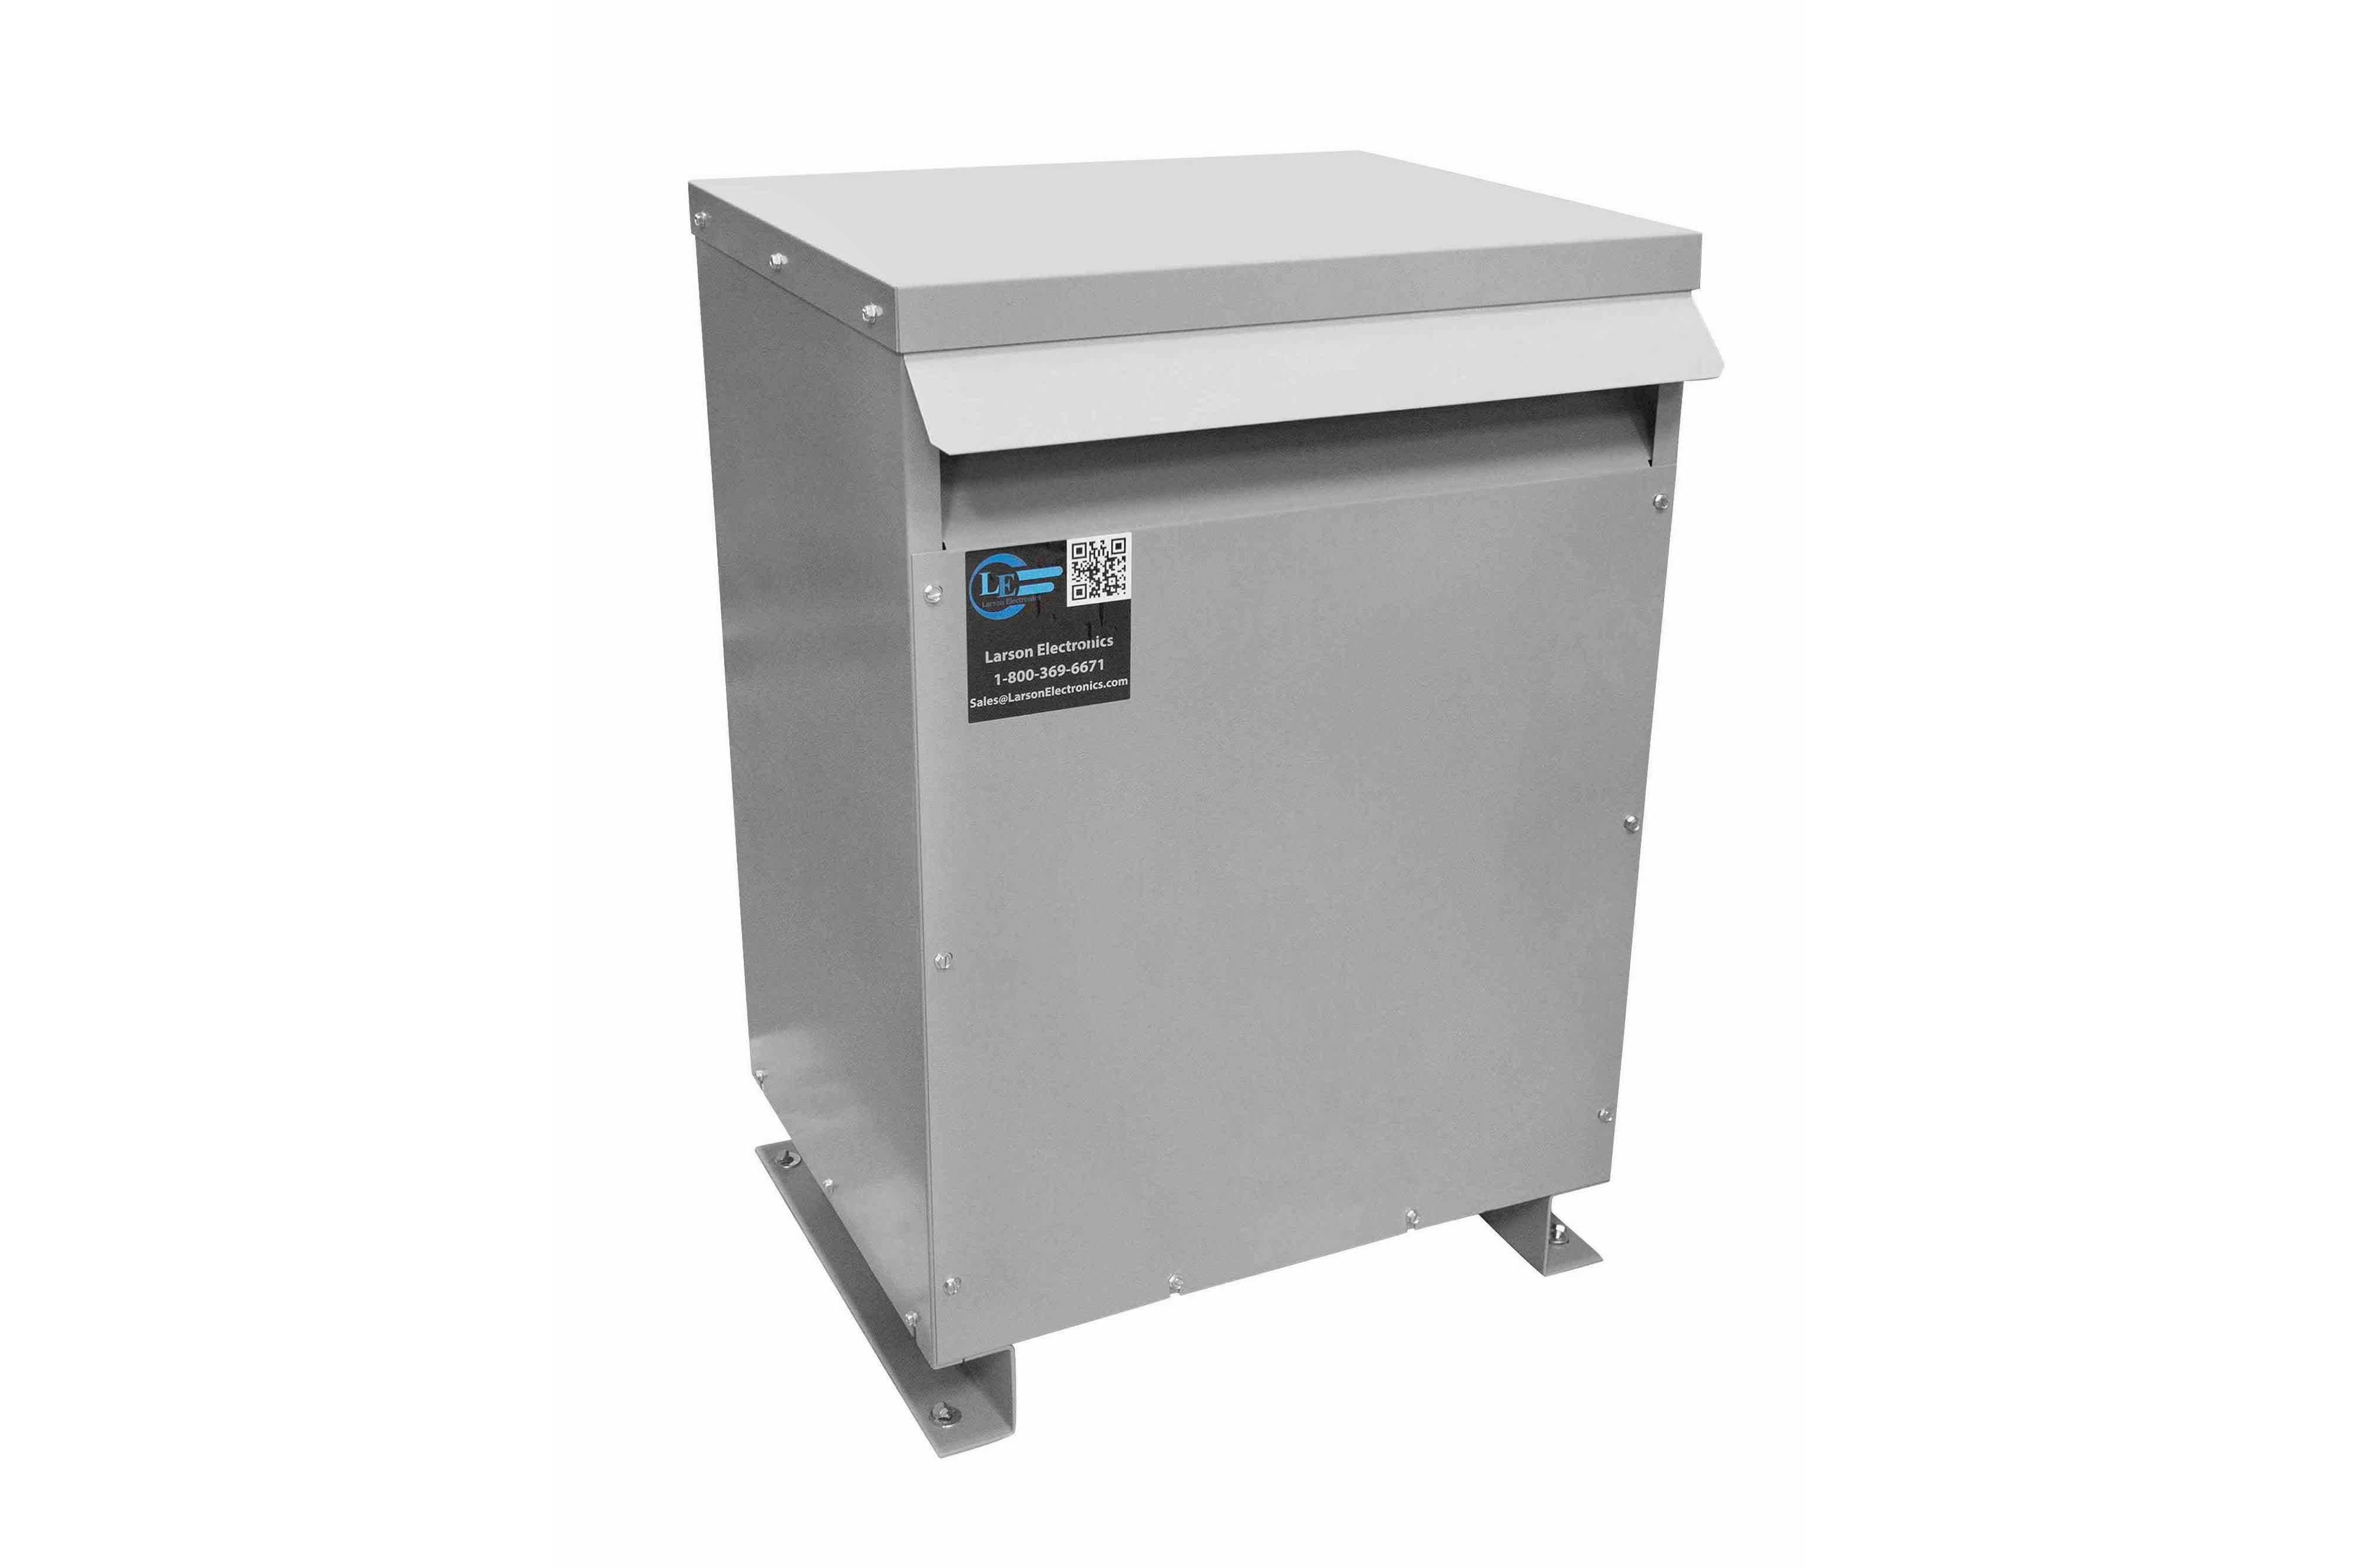 52.5 kVA 3PH Isolation Transformer, 480V Wye Primary, 208V Delta Secondary, N3R, Ventilated, 60 Hz